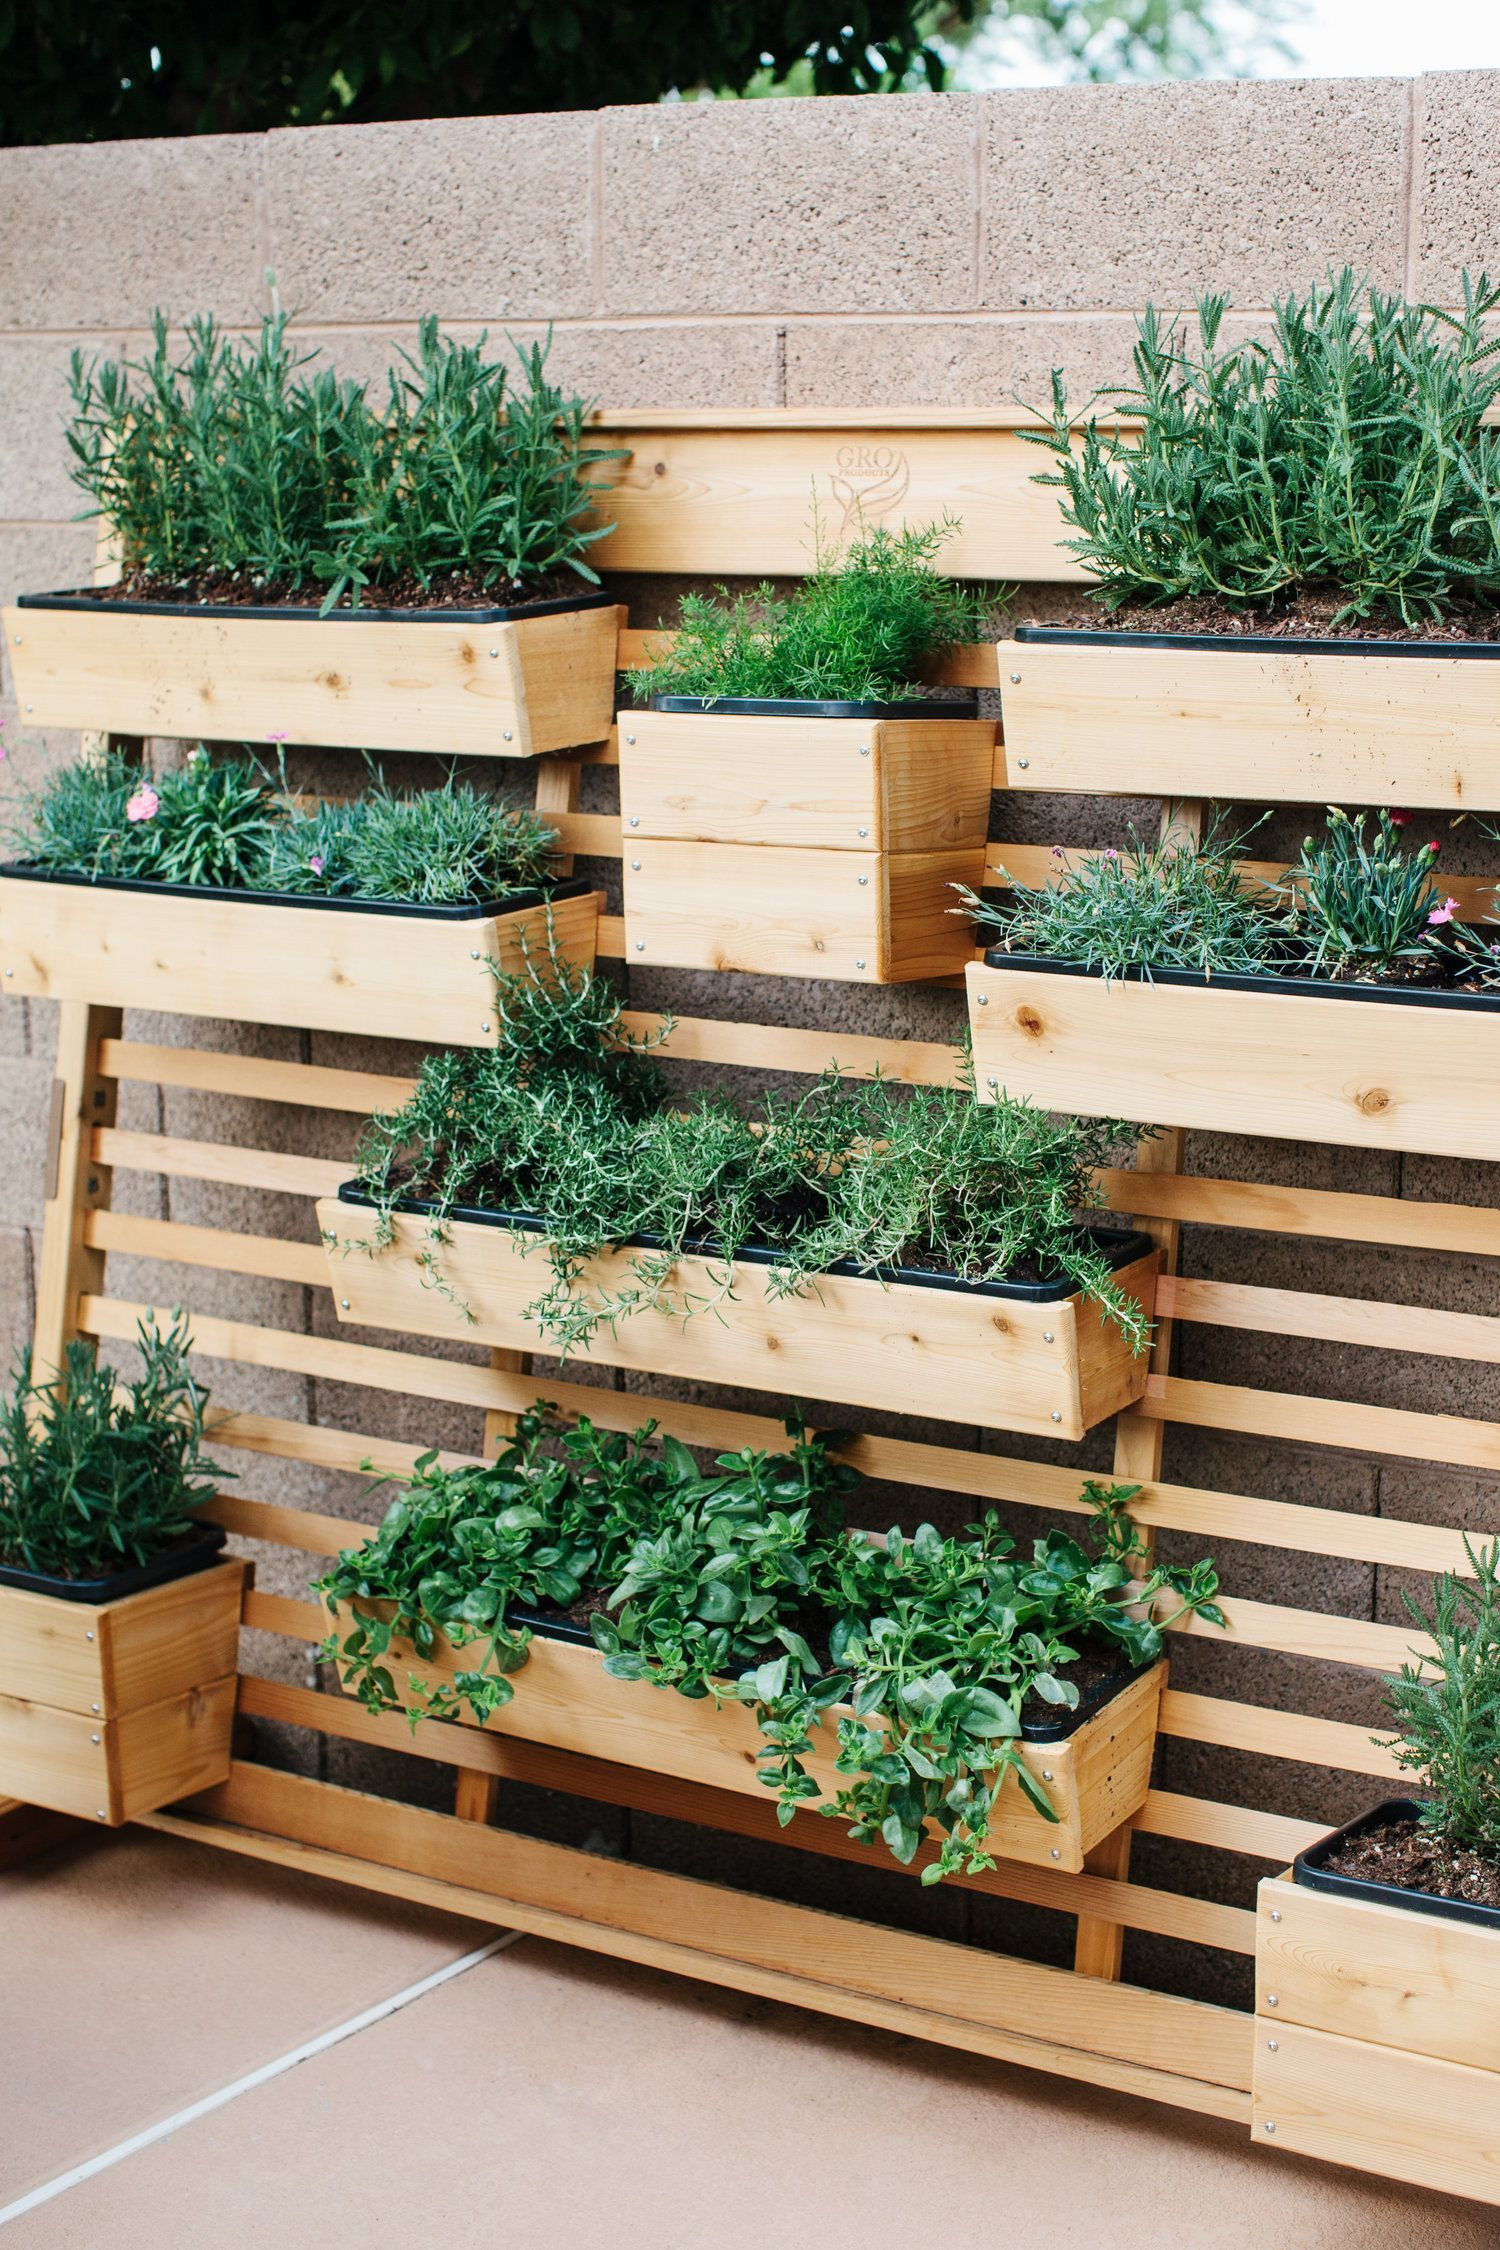 59 Inspiring Vertical Garden Ideas For Your Small Space Small